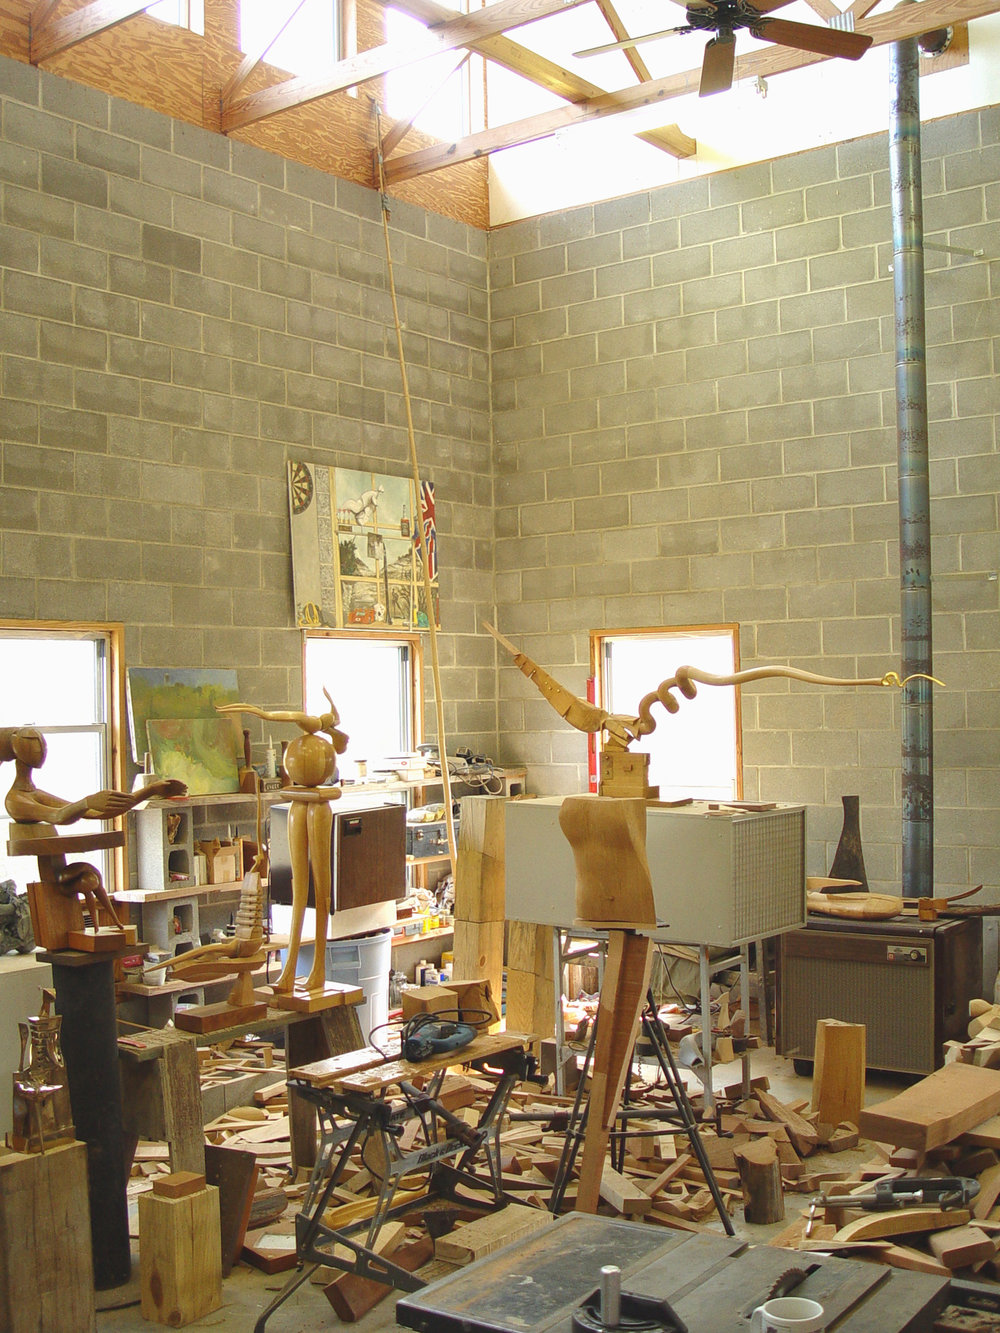 Evett's Studio